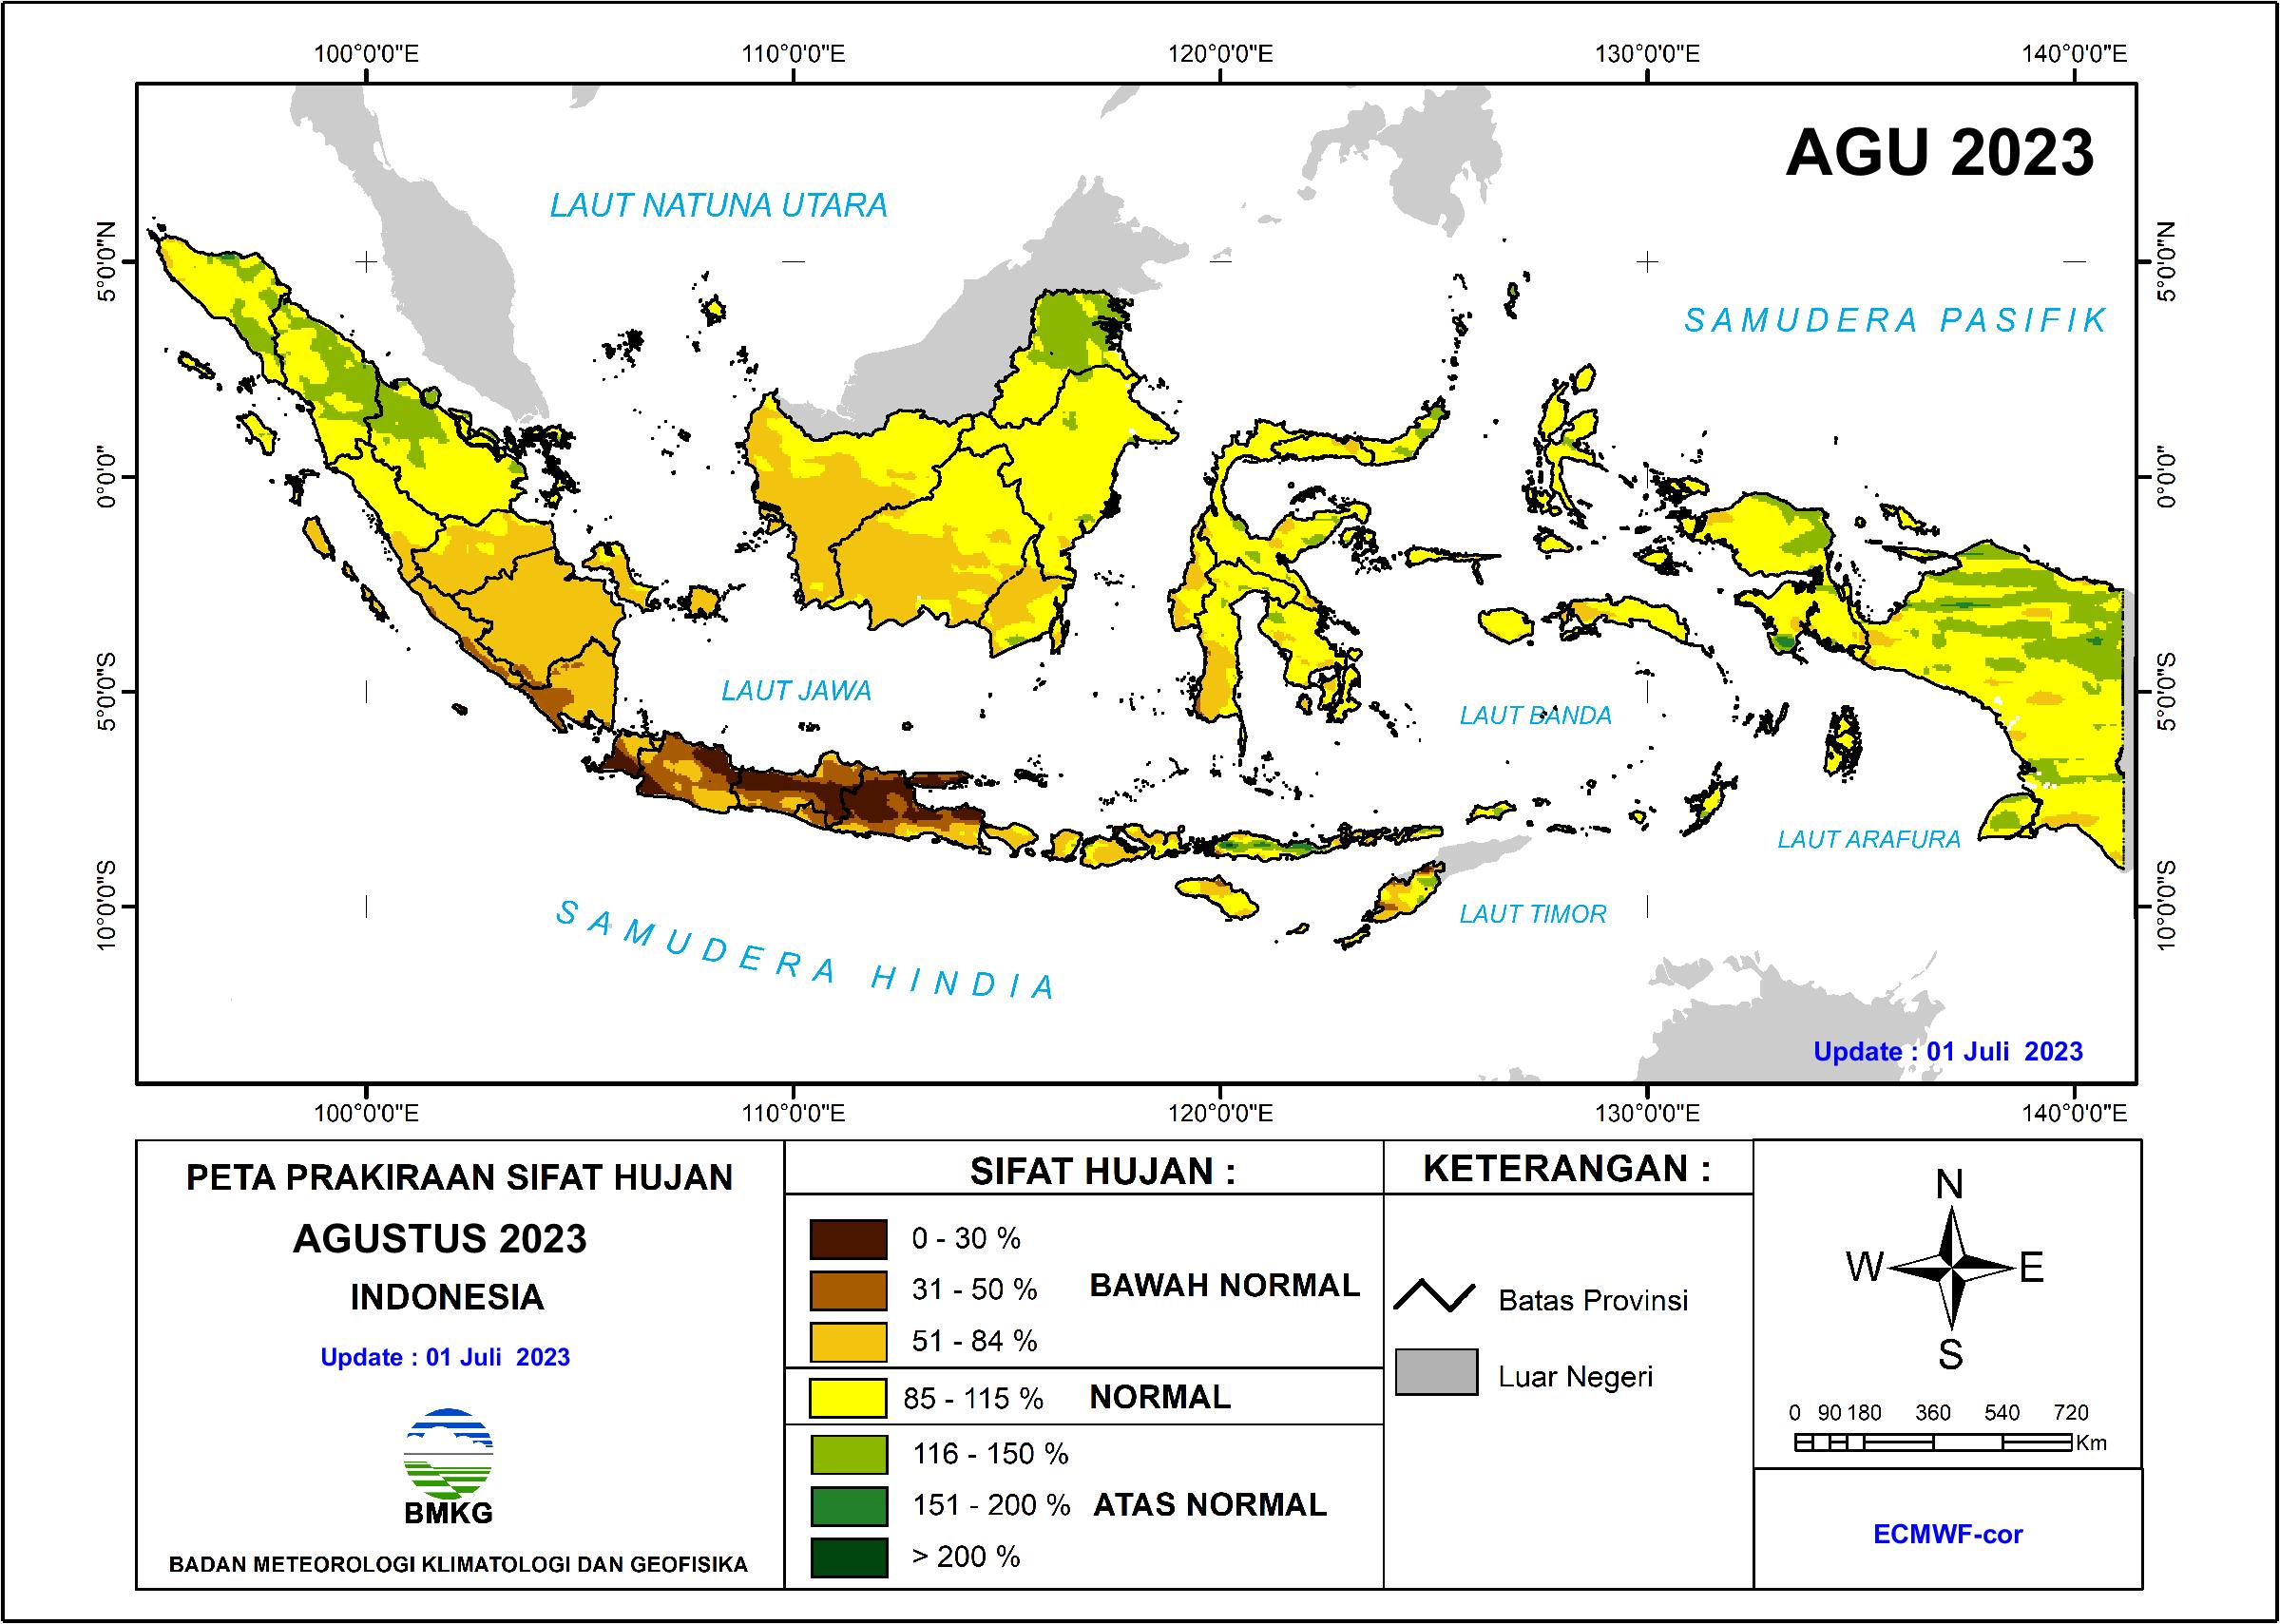 Prakiraan Sifat Hujan Bulanan - Indonesia